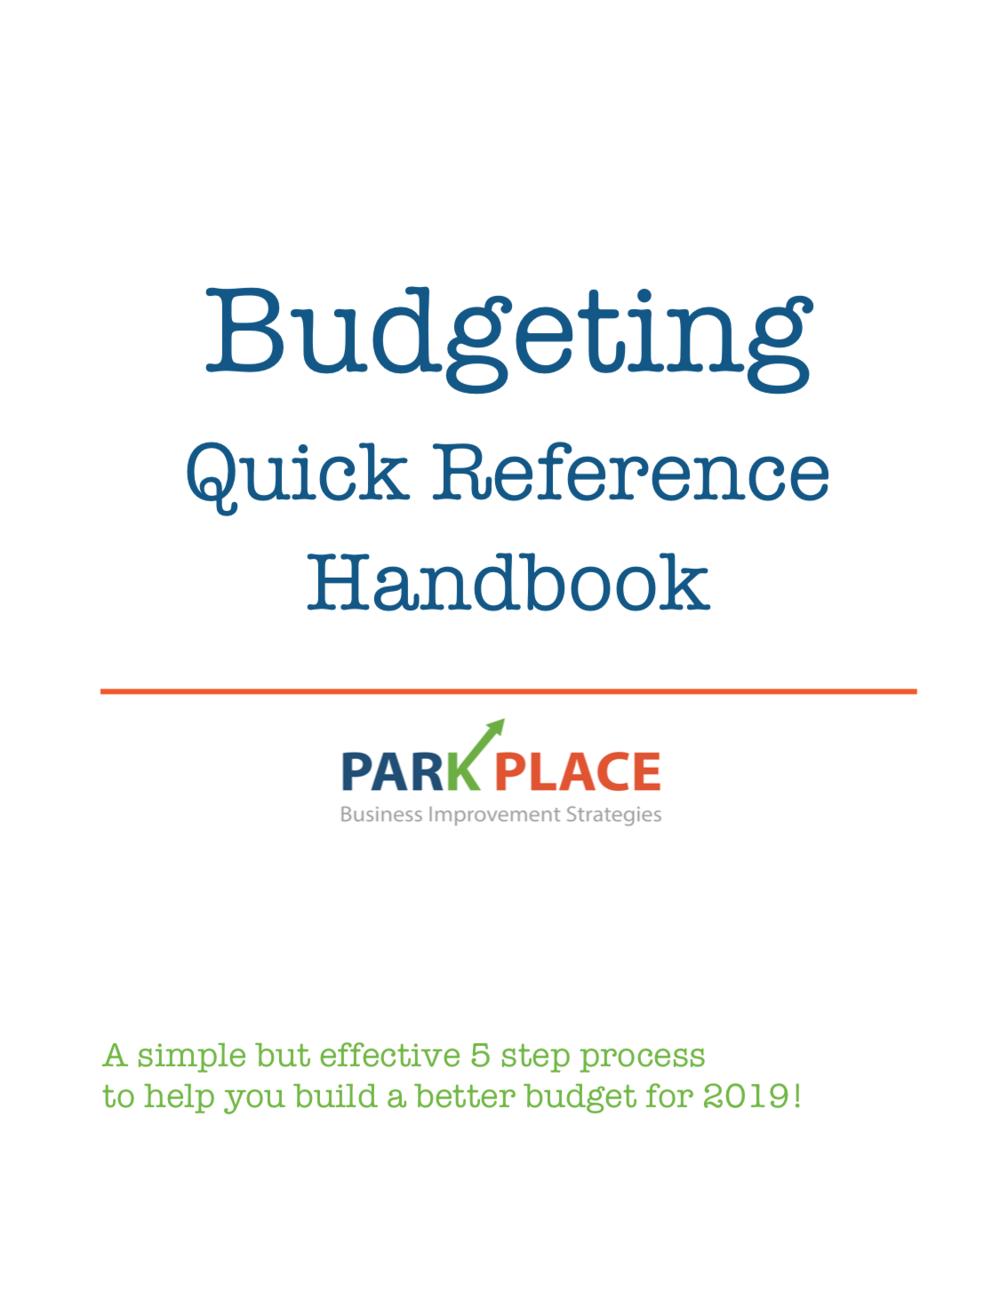 Budgeting Handbook icon.png